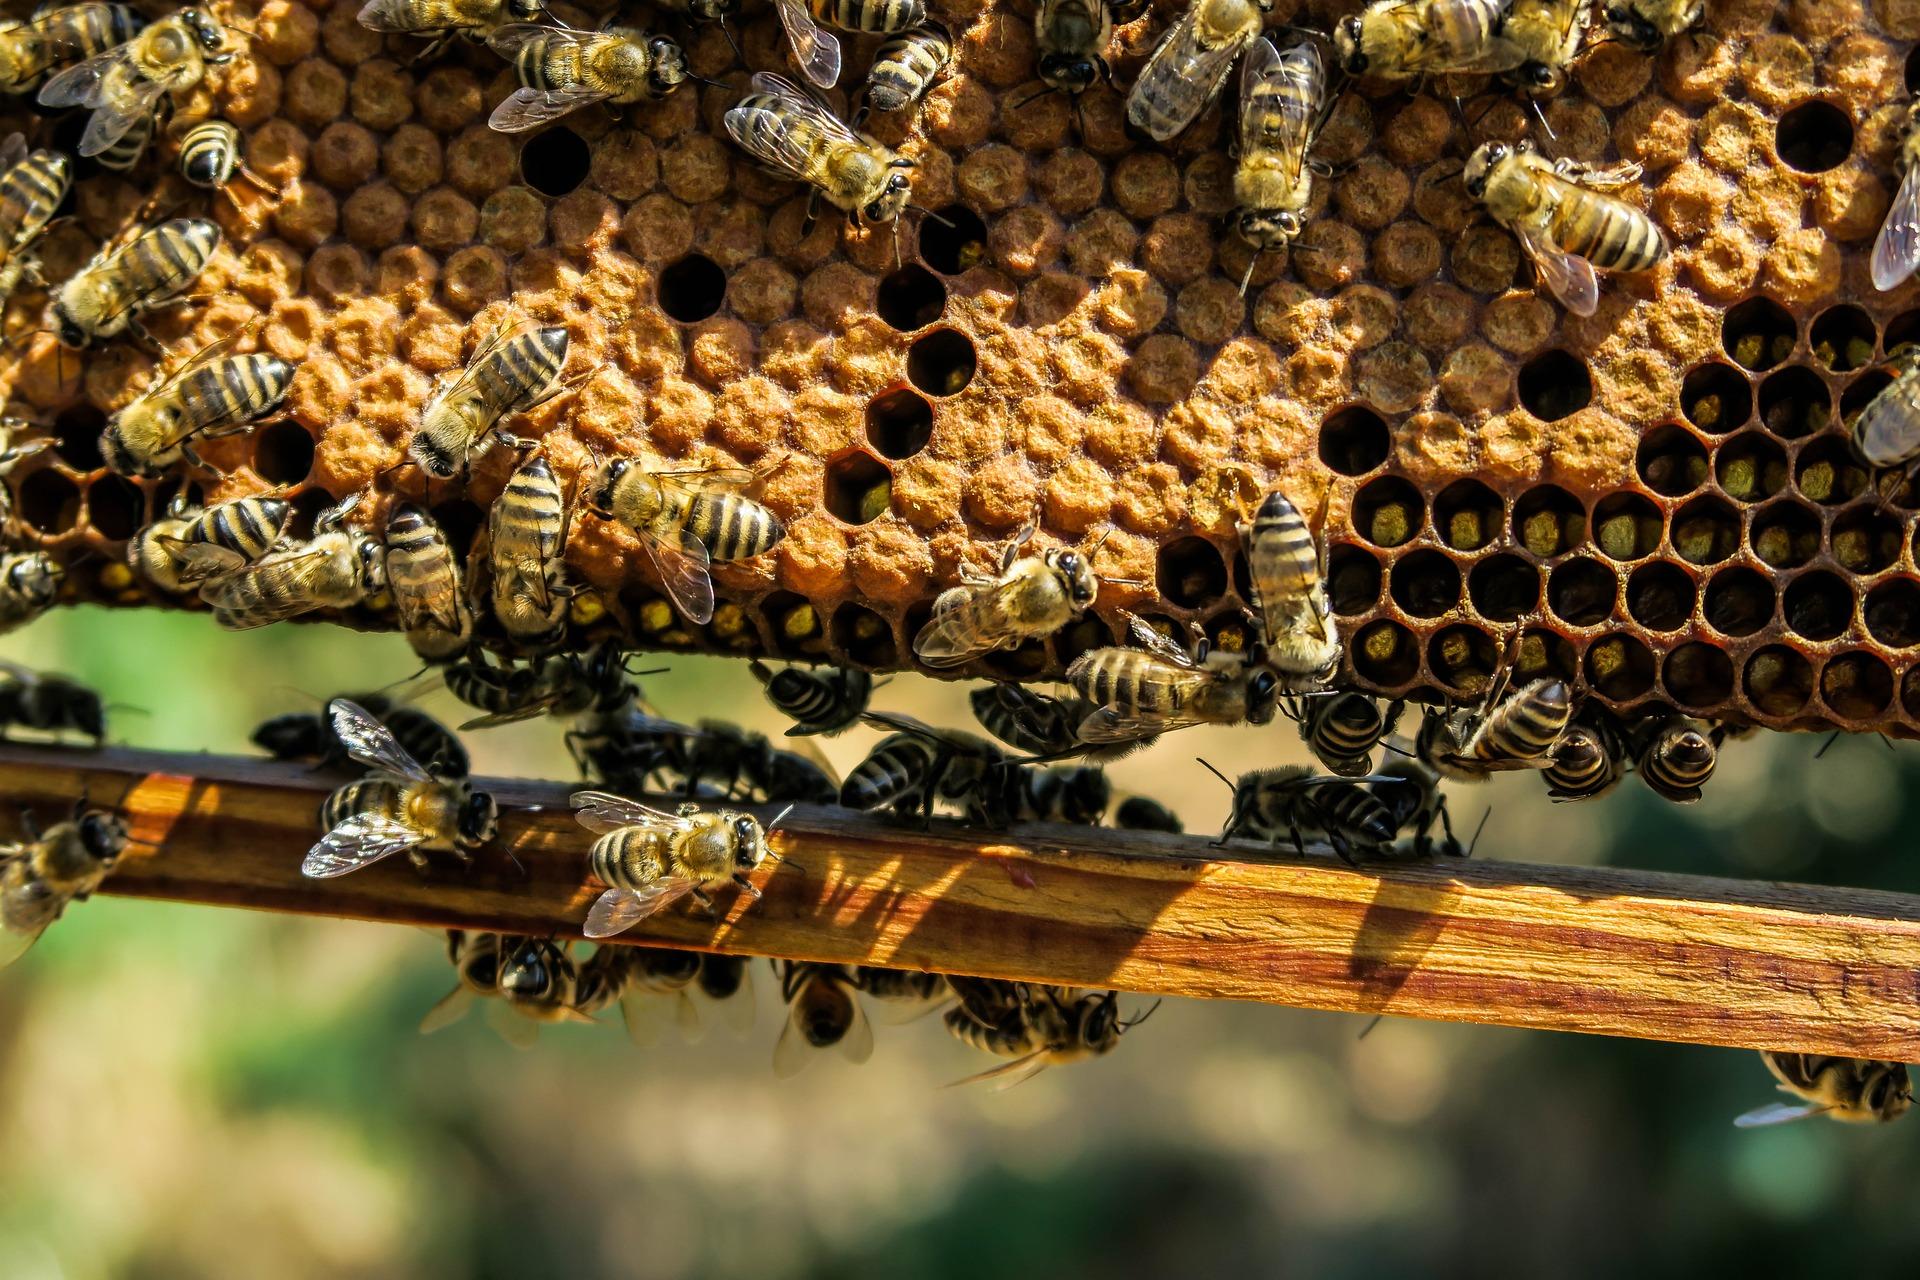 Mehiläiskenno. Pixabay.